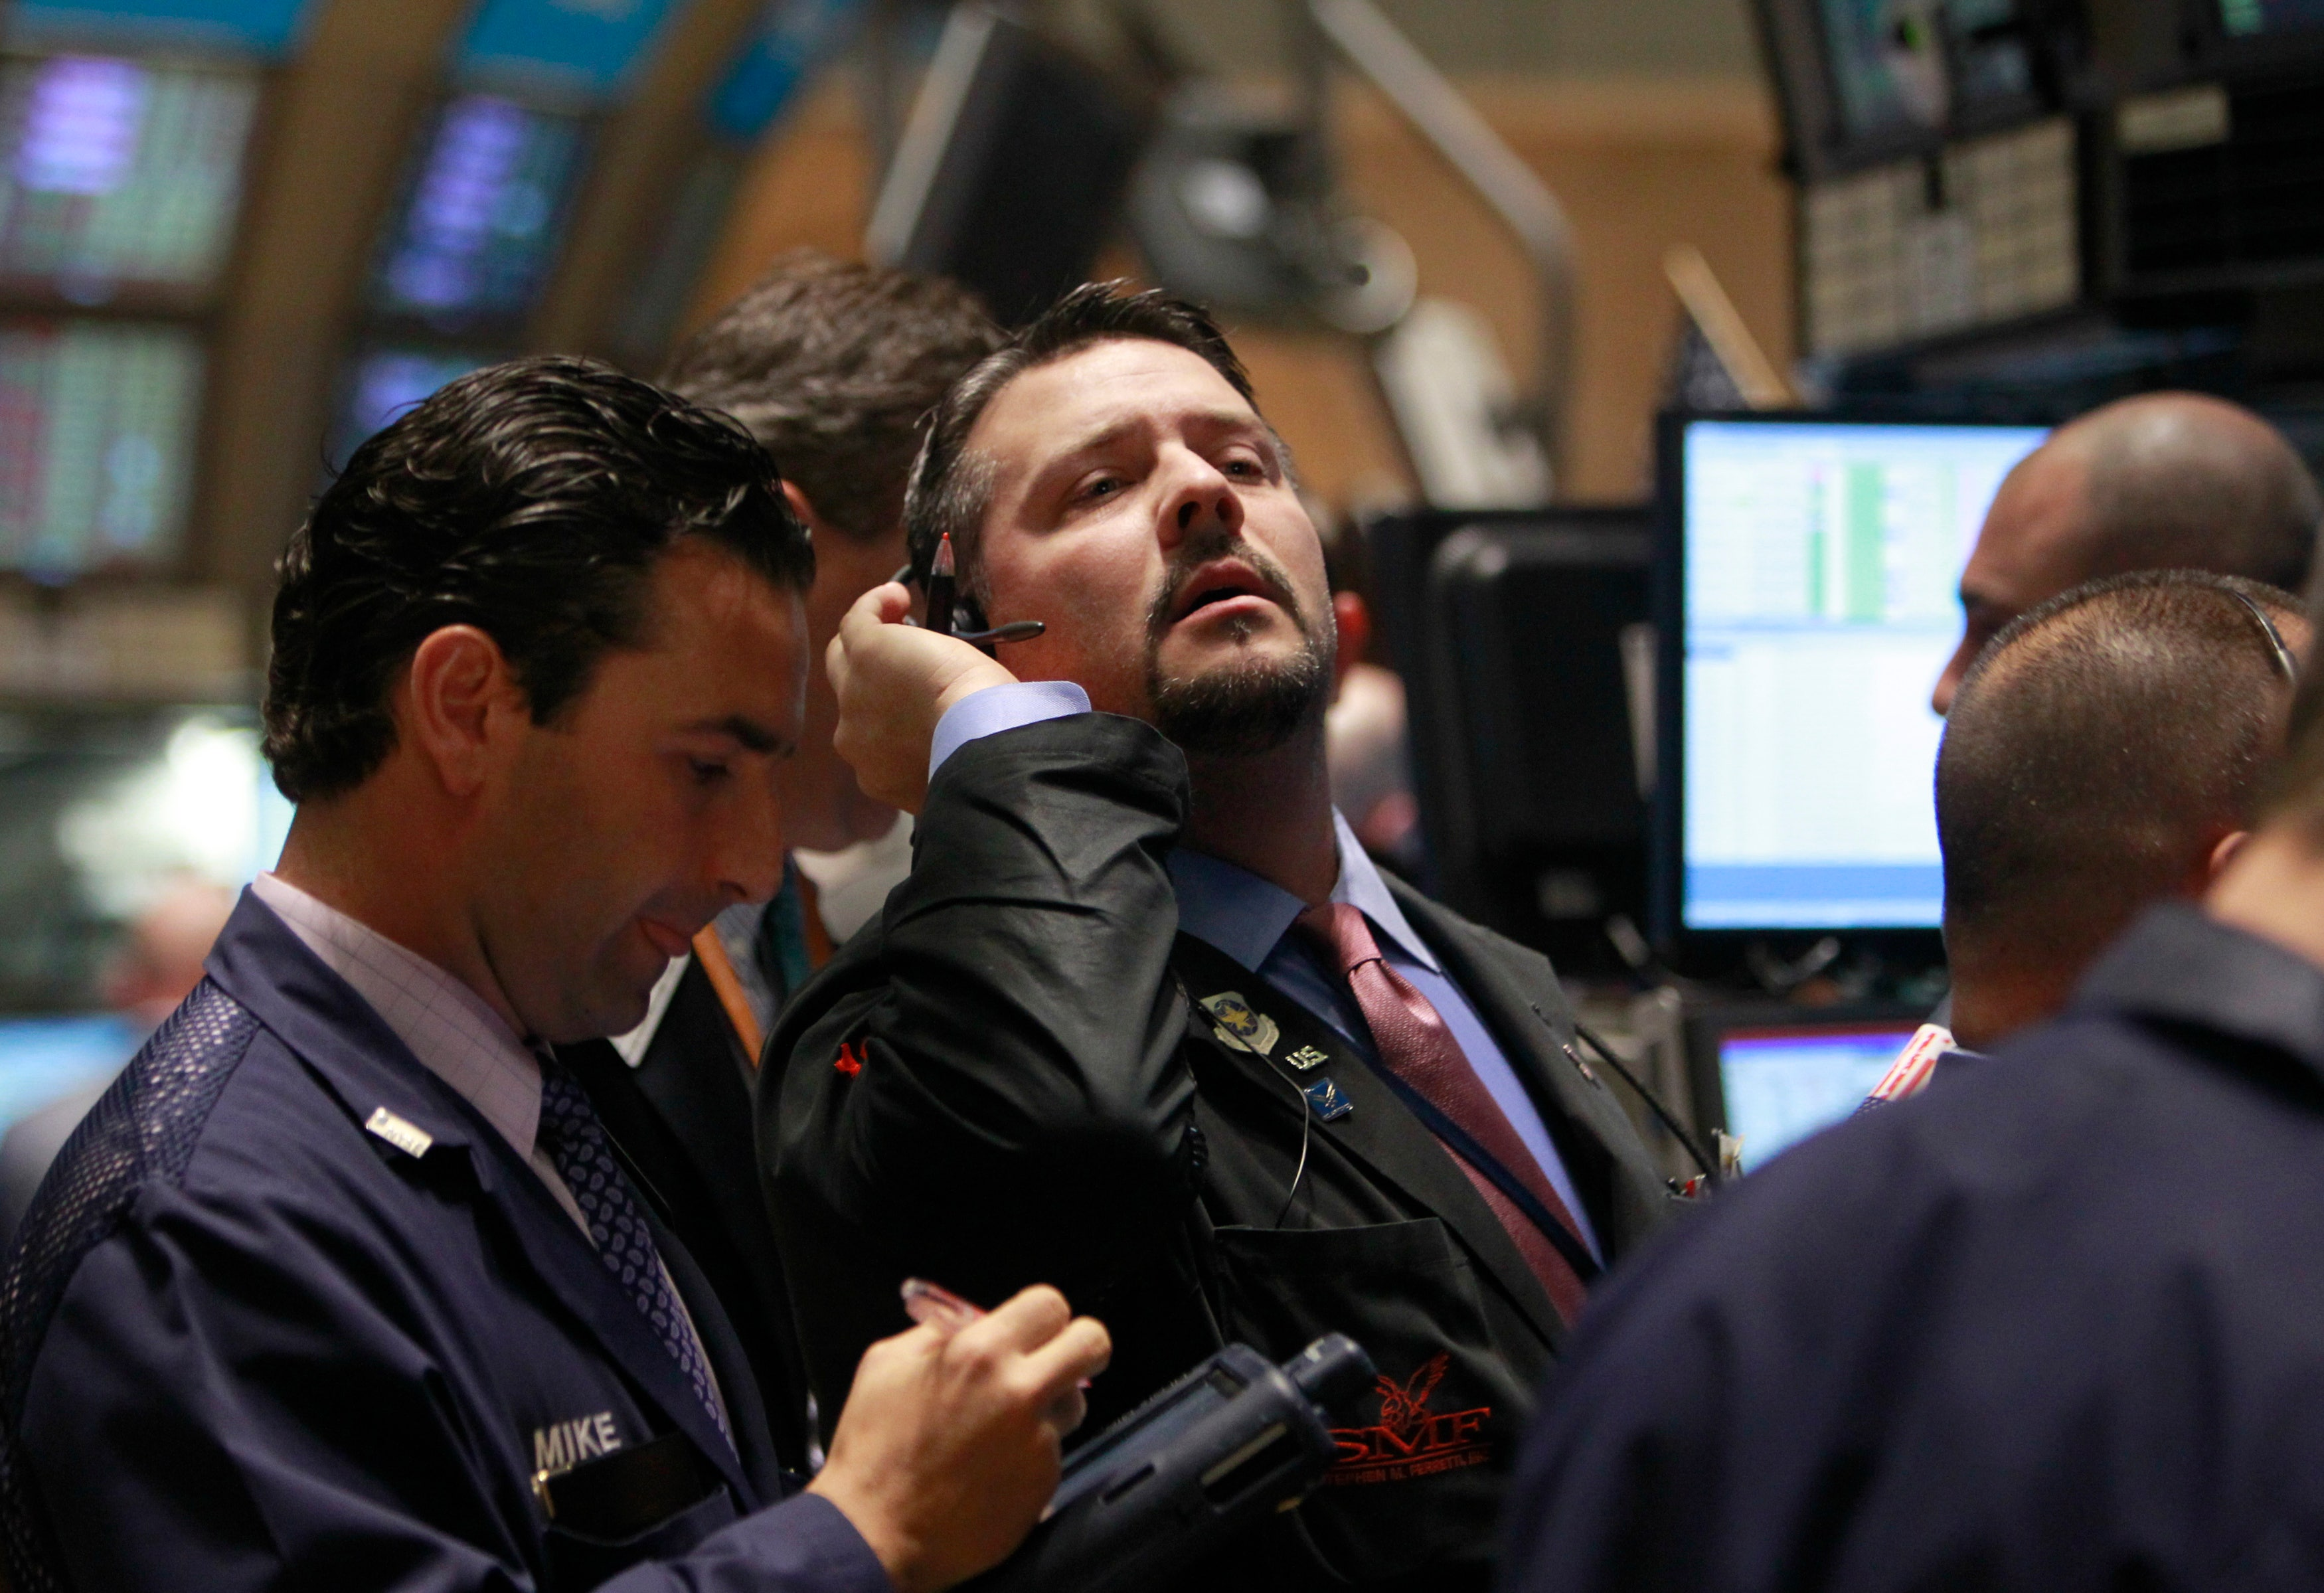 www.foxbusiness.com: US stocks dip after FDA pauses J&J COVID-19 vaccine